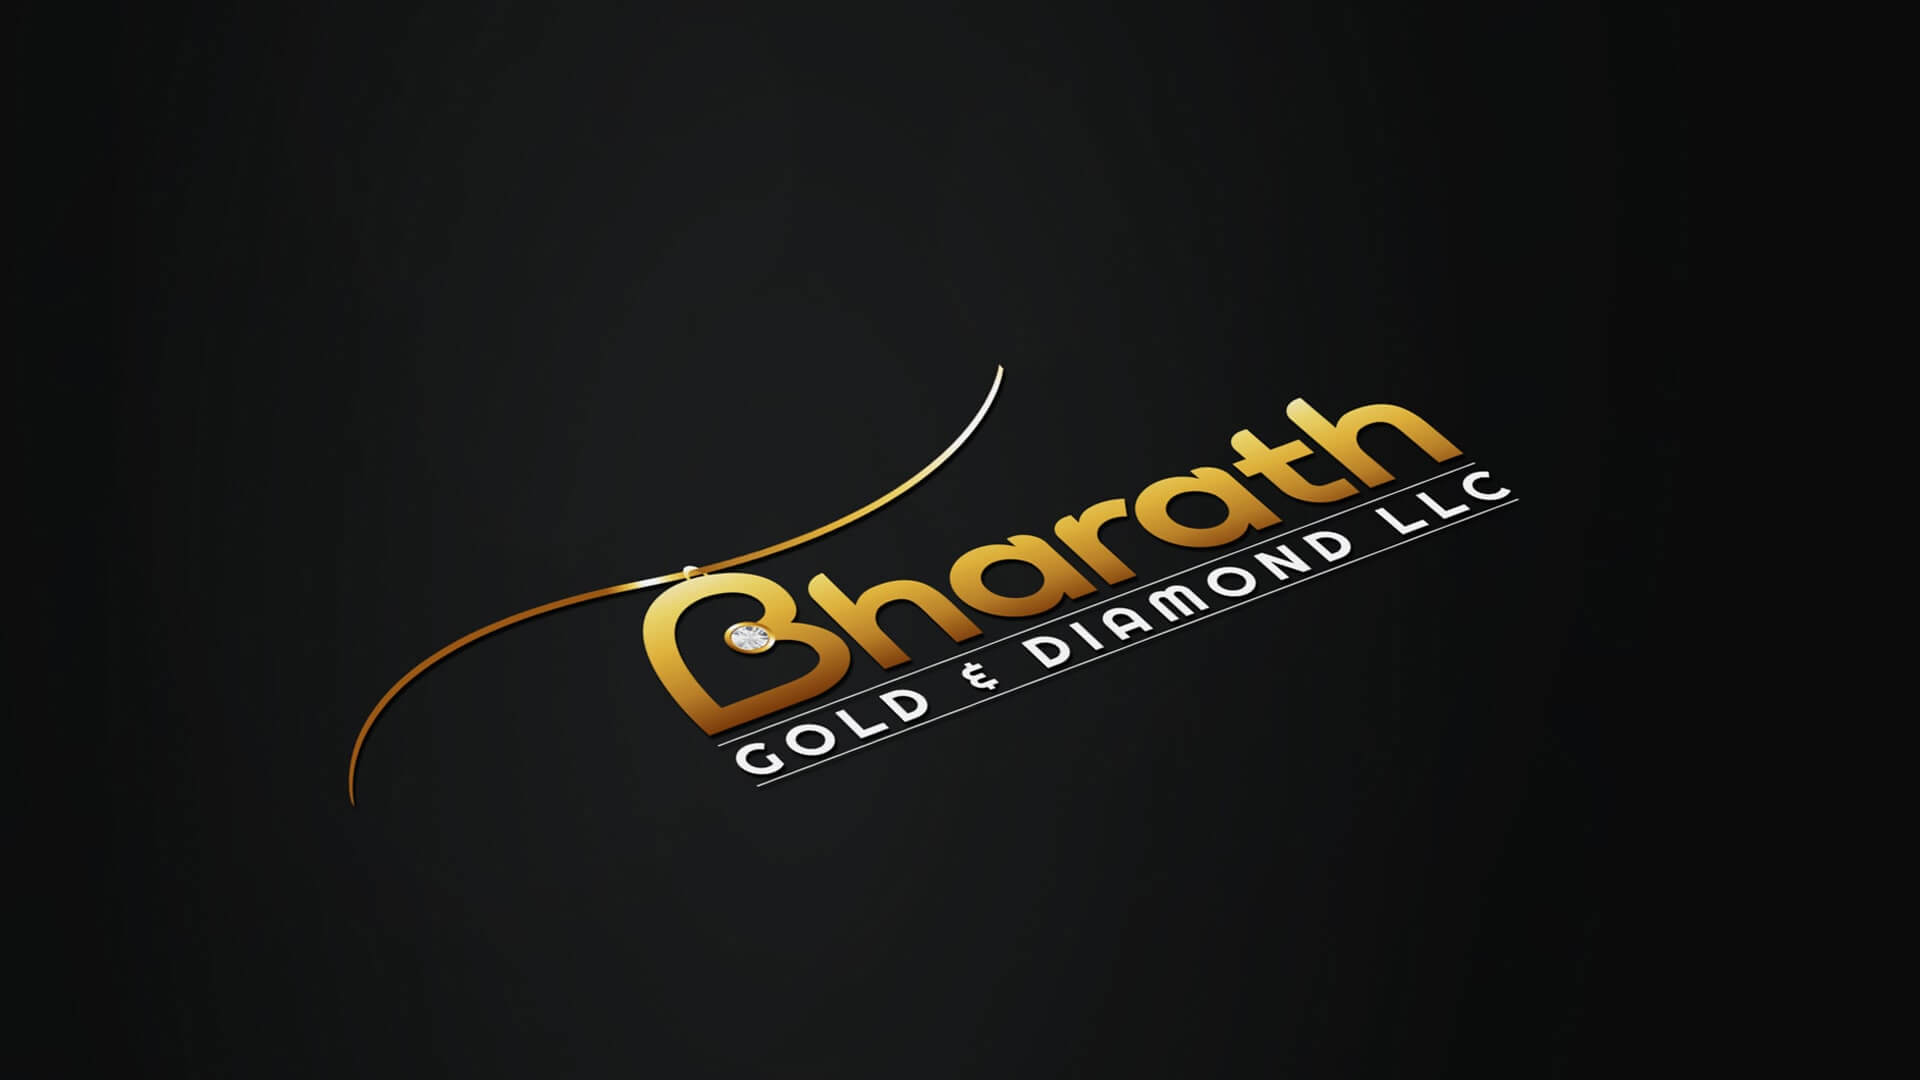 Bharath Gold & Diamonds Main Webthrob Advertising Agency in Kerala Website Designing Agency in Kerala Social Media Marketing +917034034444-min (1)